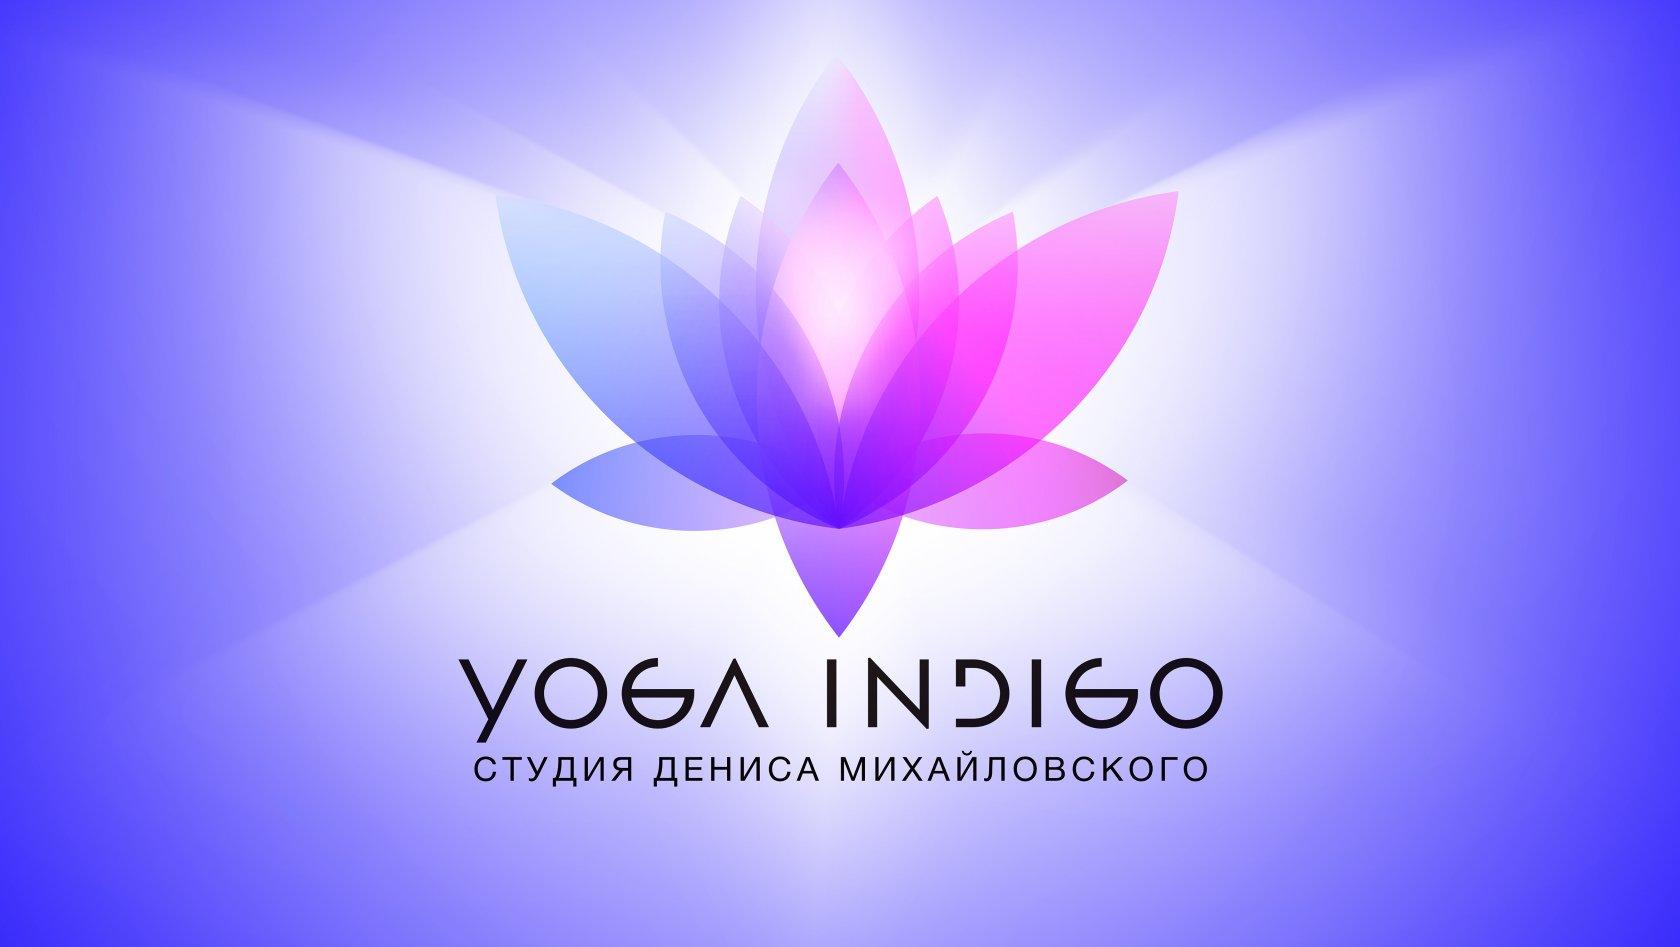 (c) Yoga-indigo-studio.ru